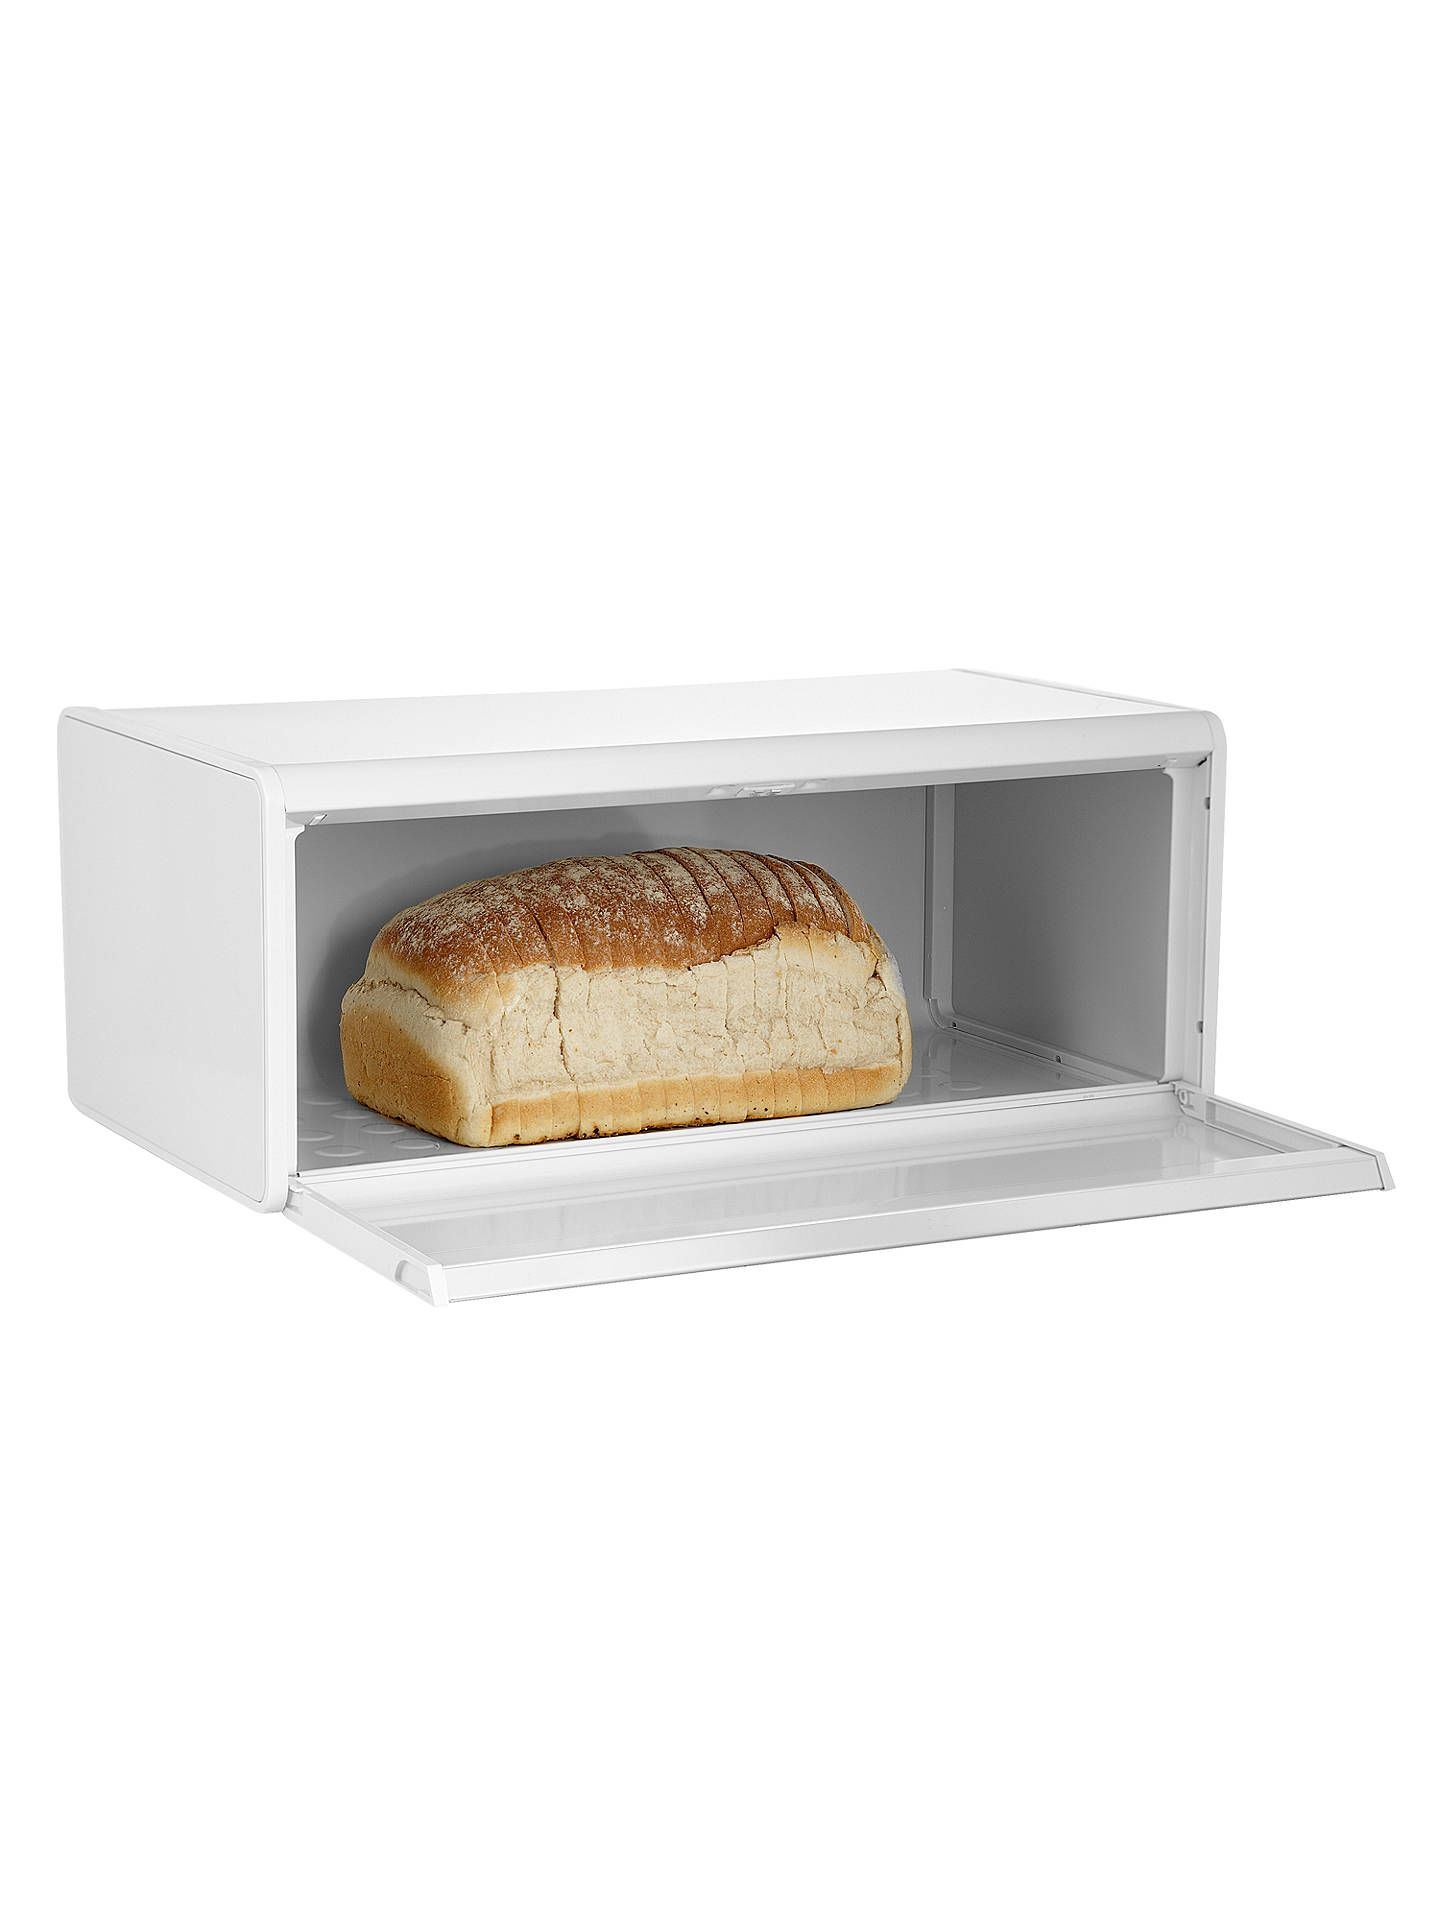 Brabantia Fall Front Bread Bin, White